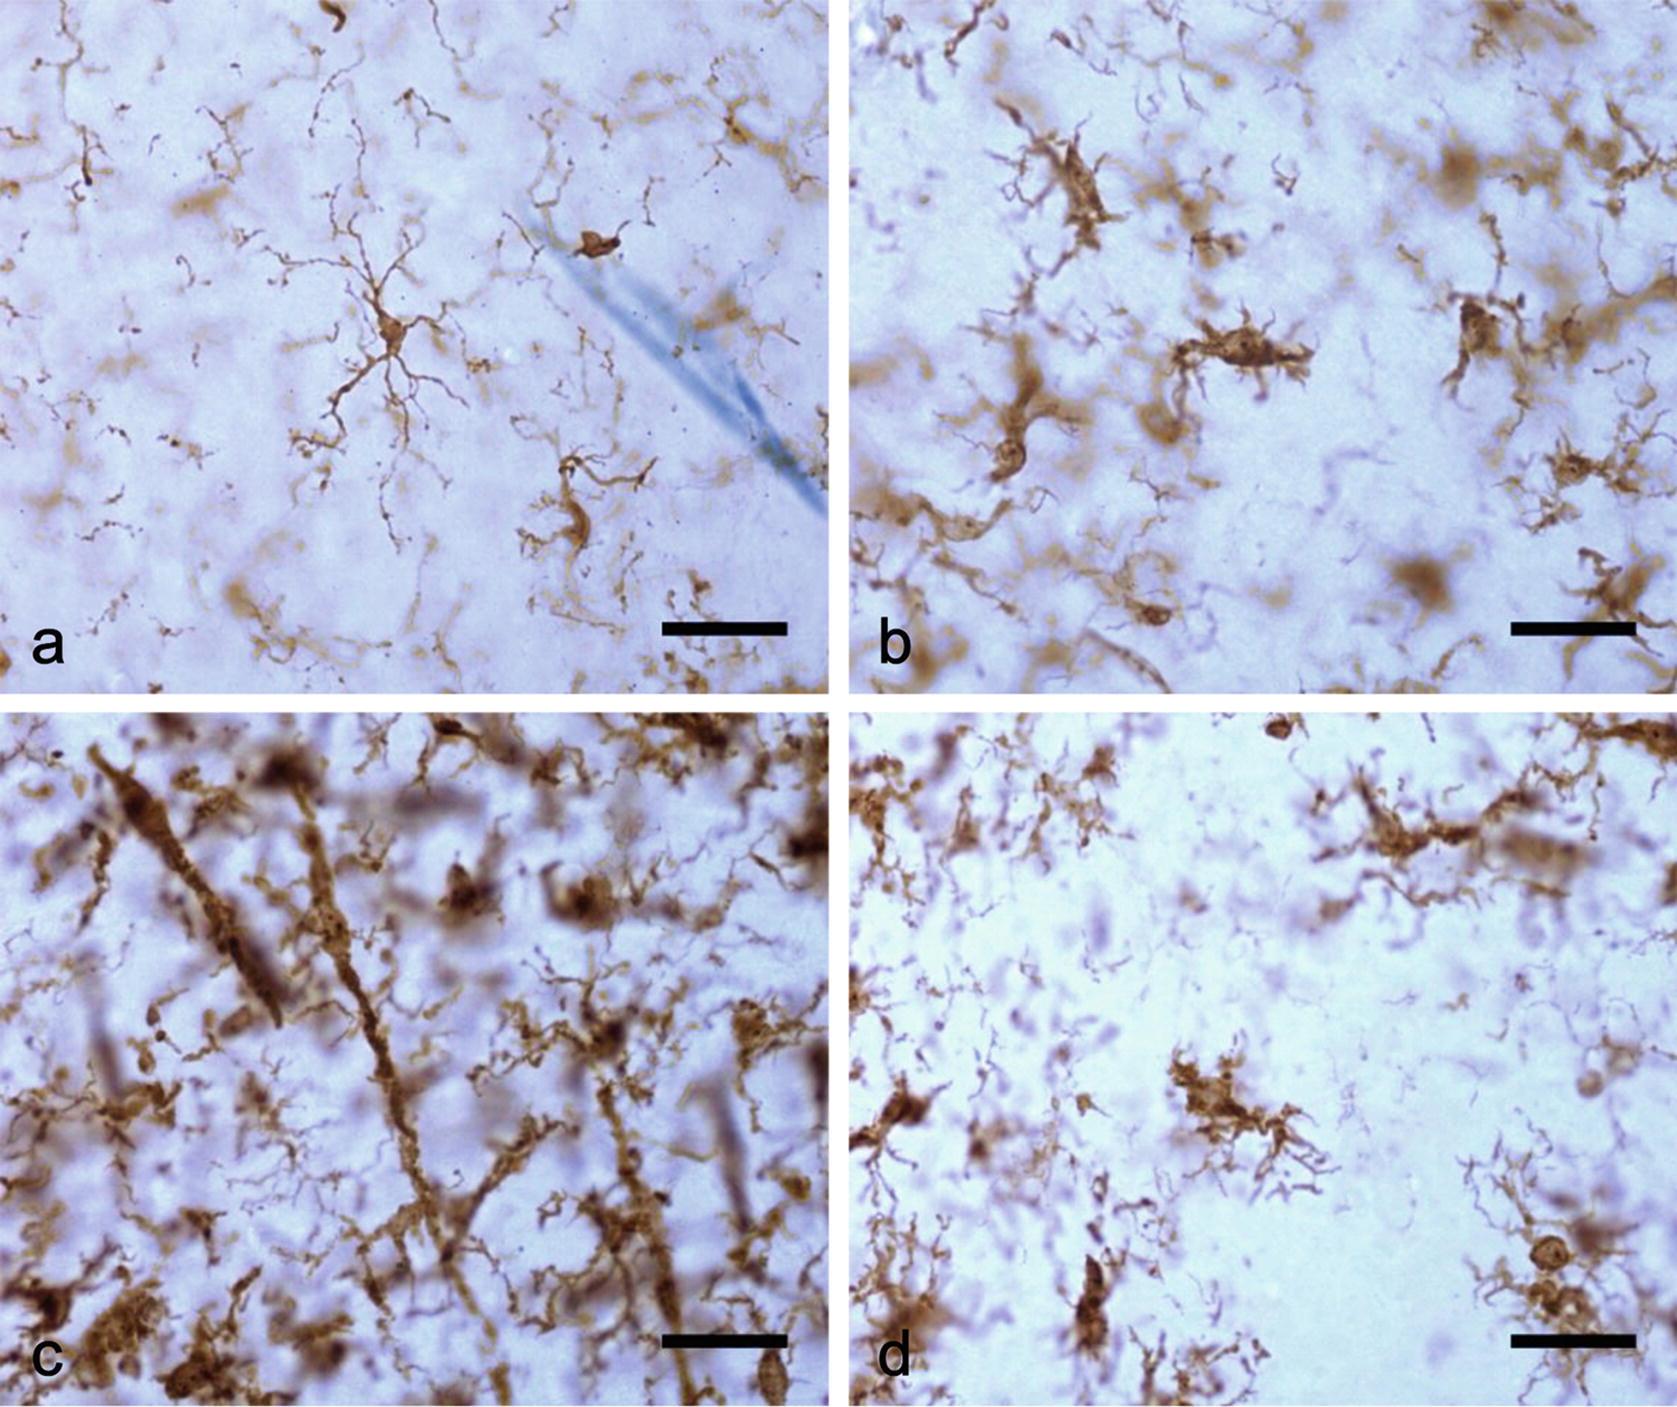 Morphology of Microglia Across Contexts of Health and Disease ...